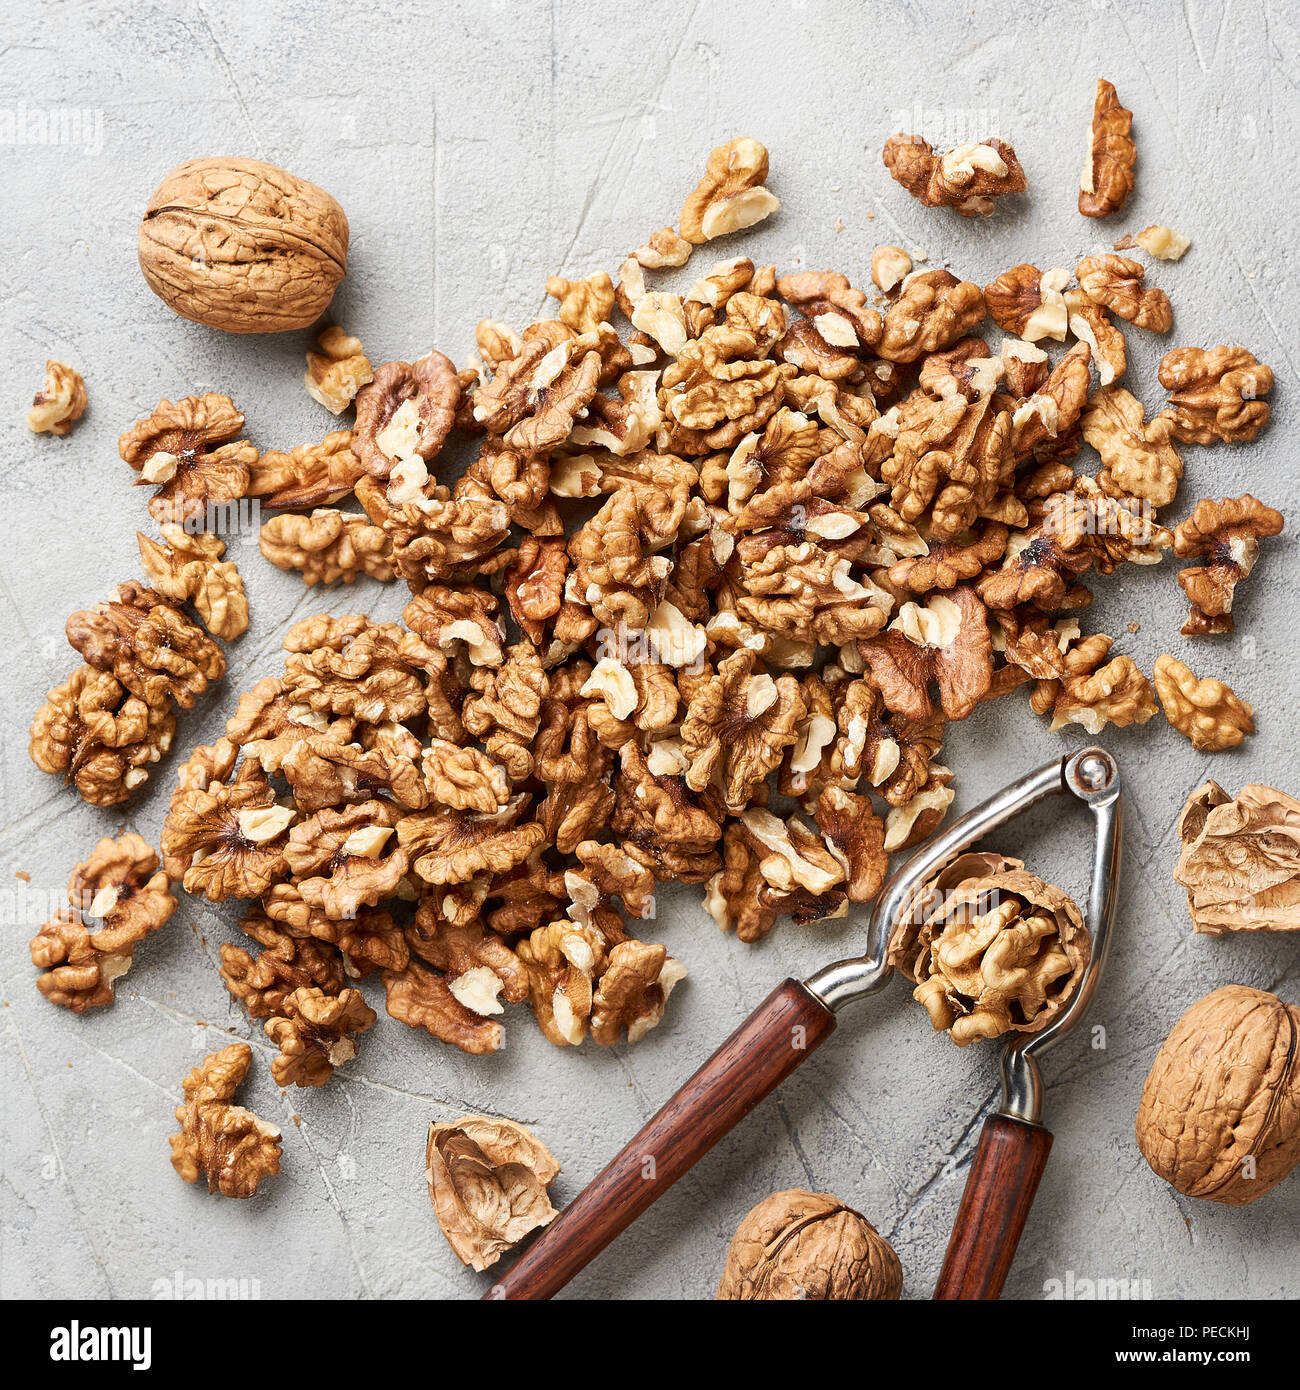 Walnut kernels on gray background and nutcracker. - Stock Image